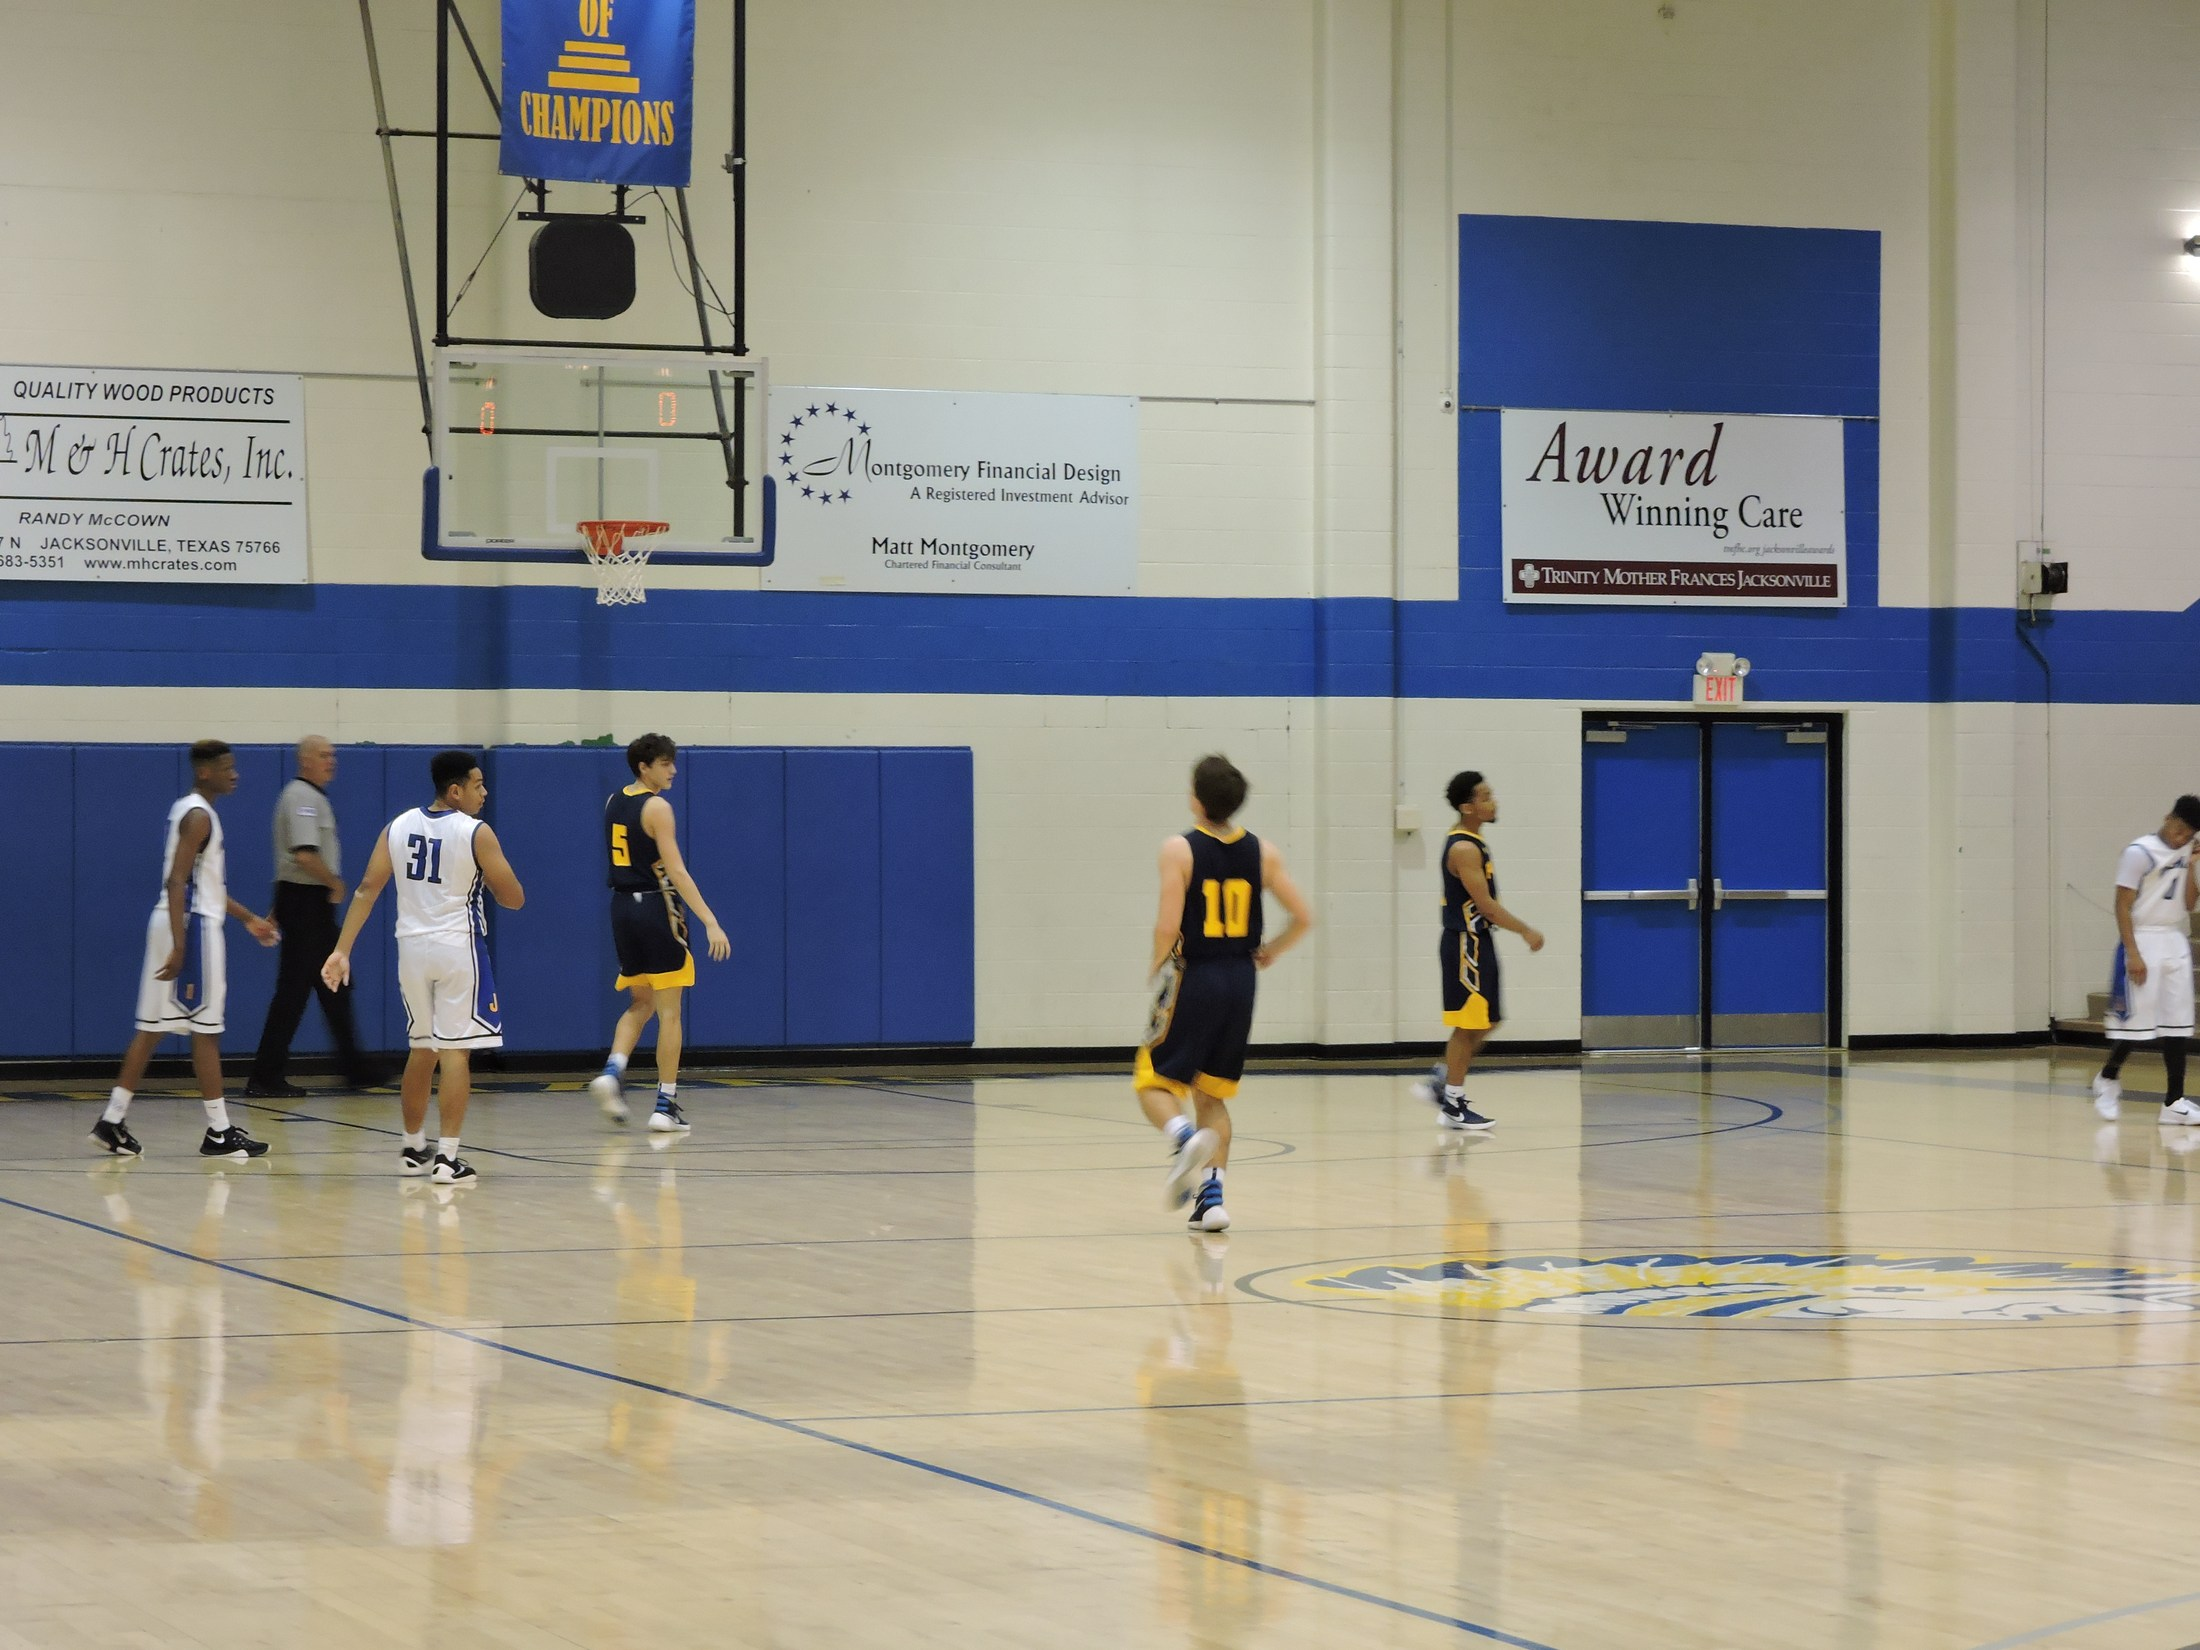 basketball game inside John Alexander Gym